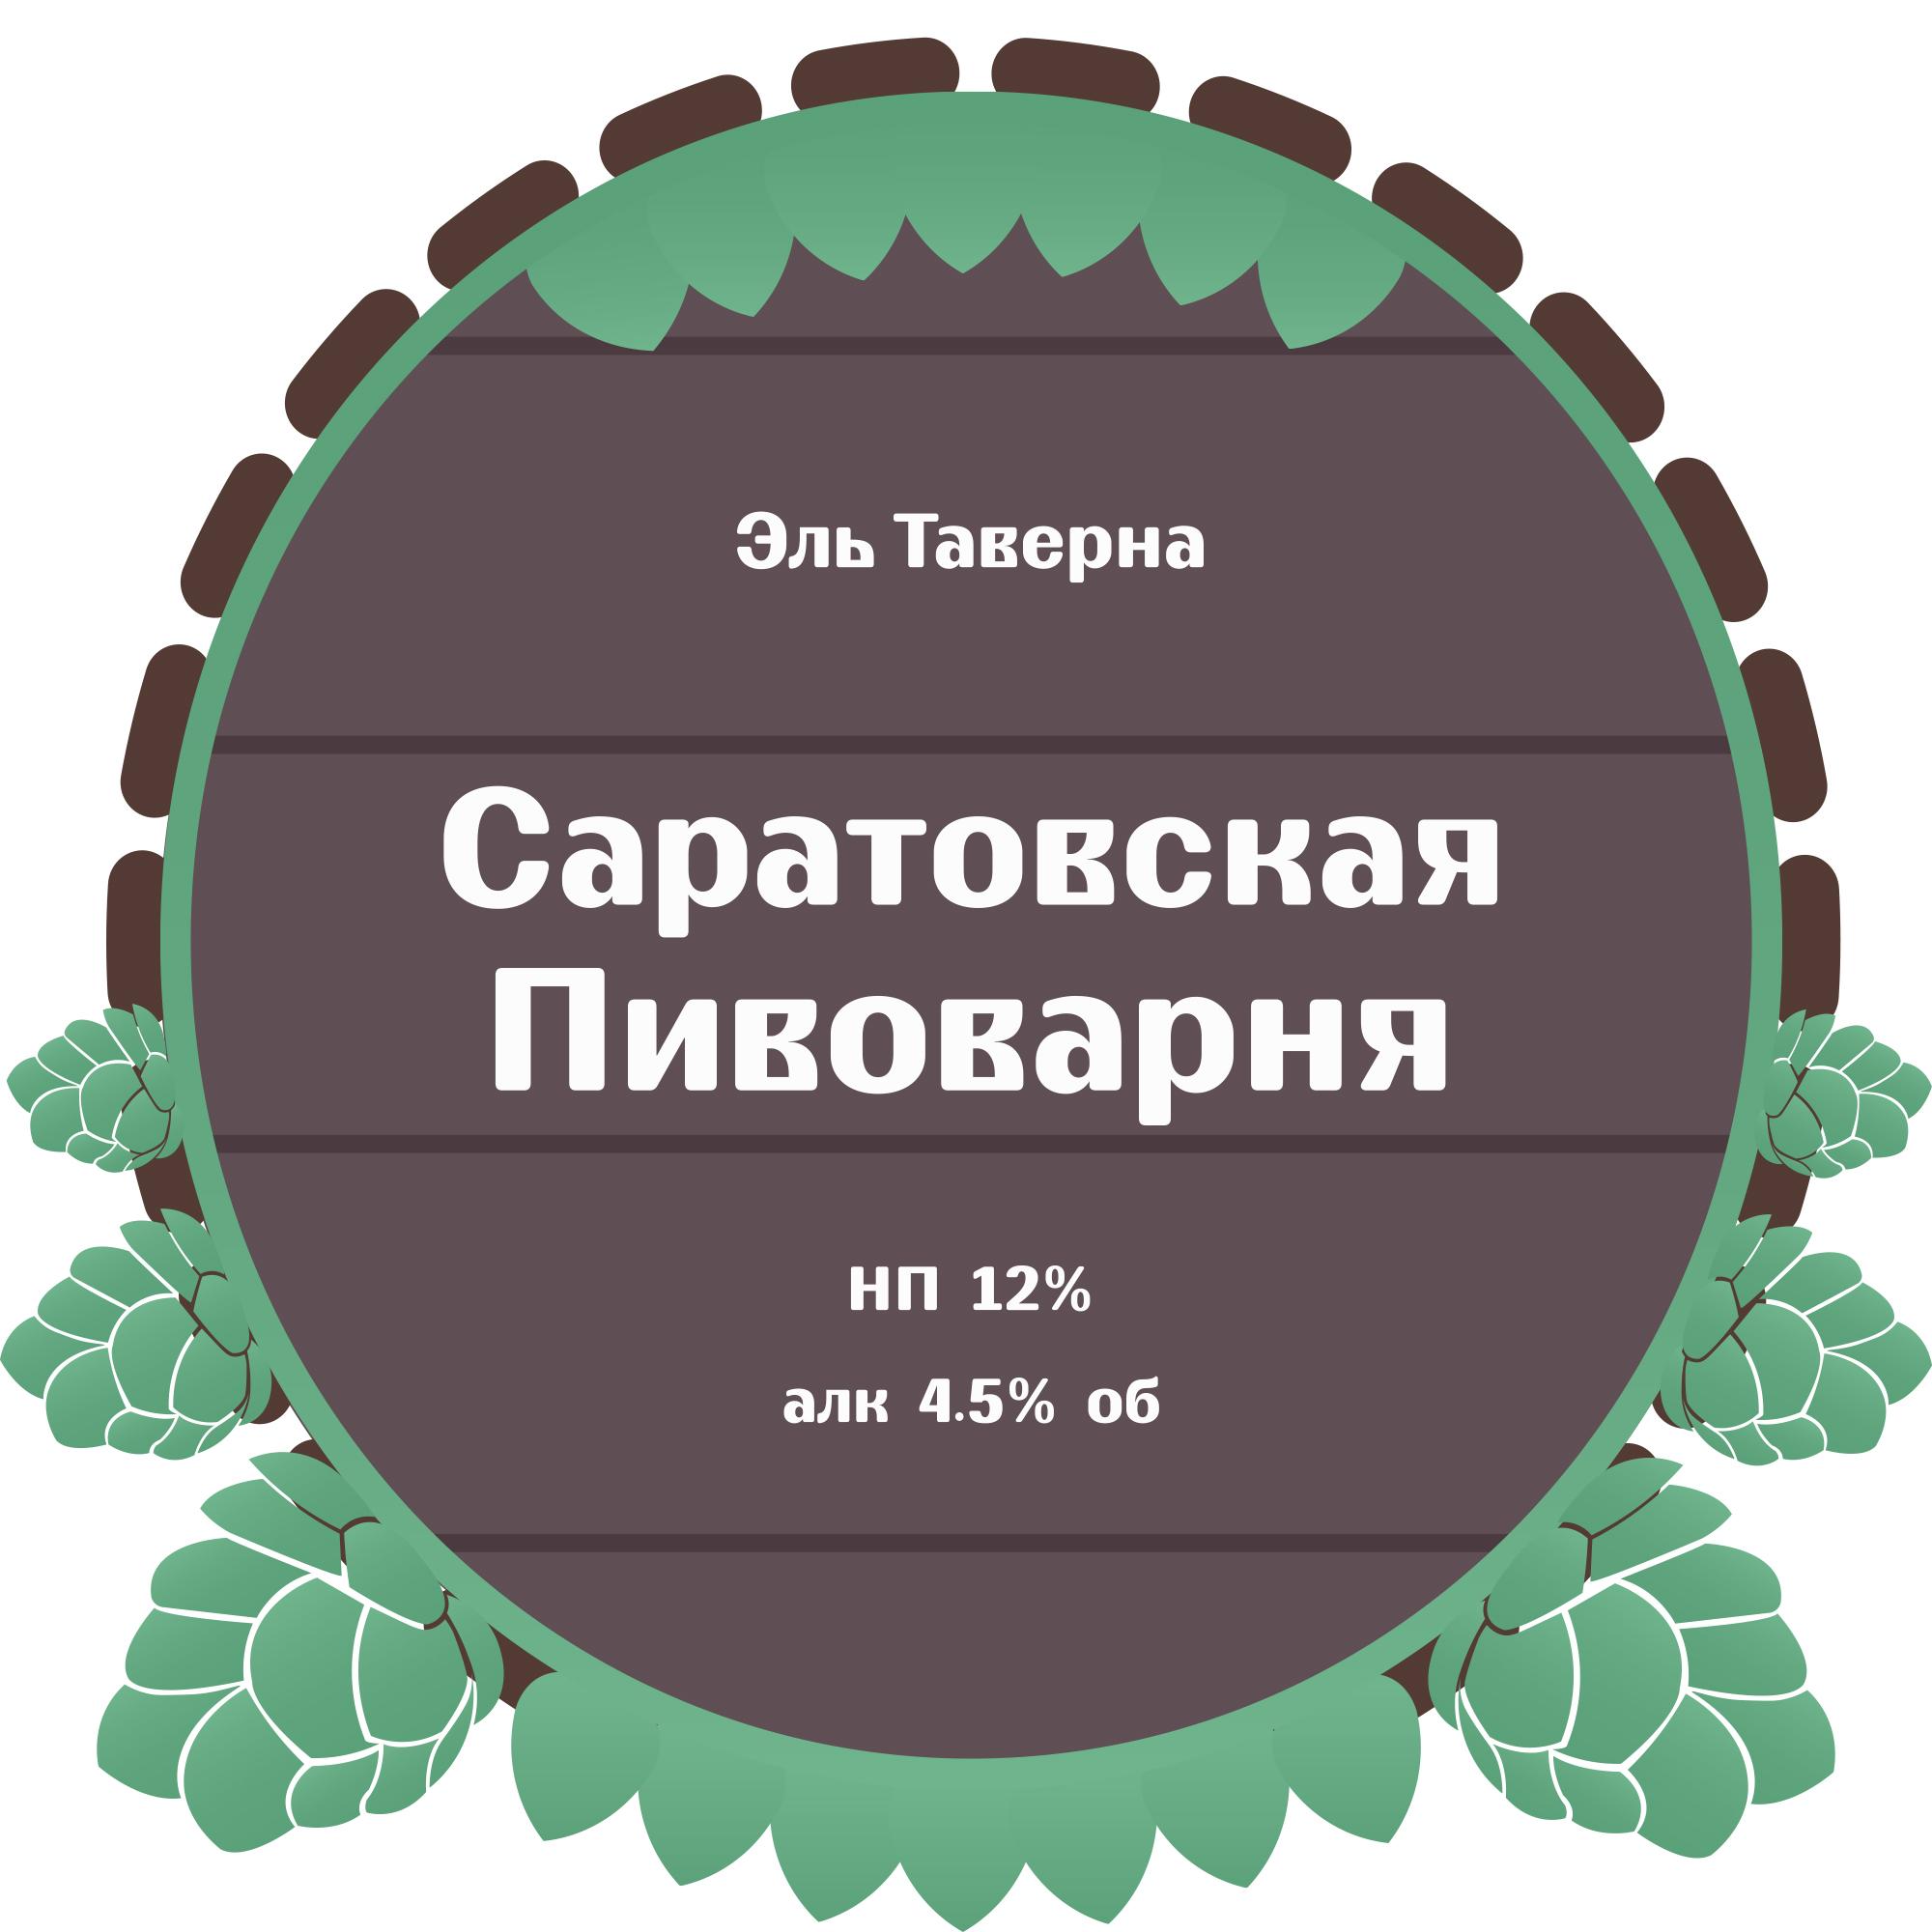 Разработка логотипа для частной пивоварни фото f_0975d7fb874aded0.jpg